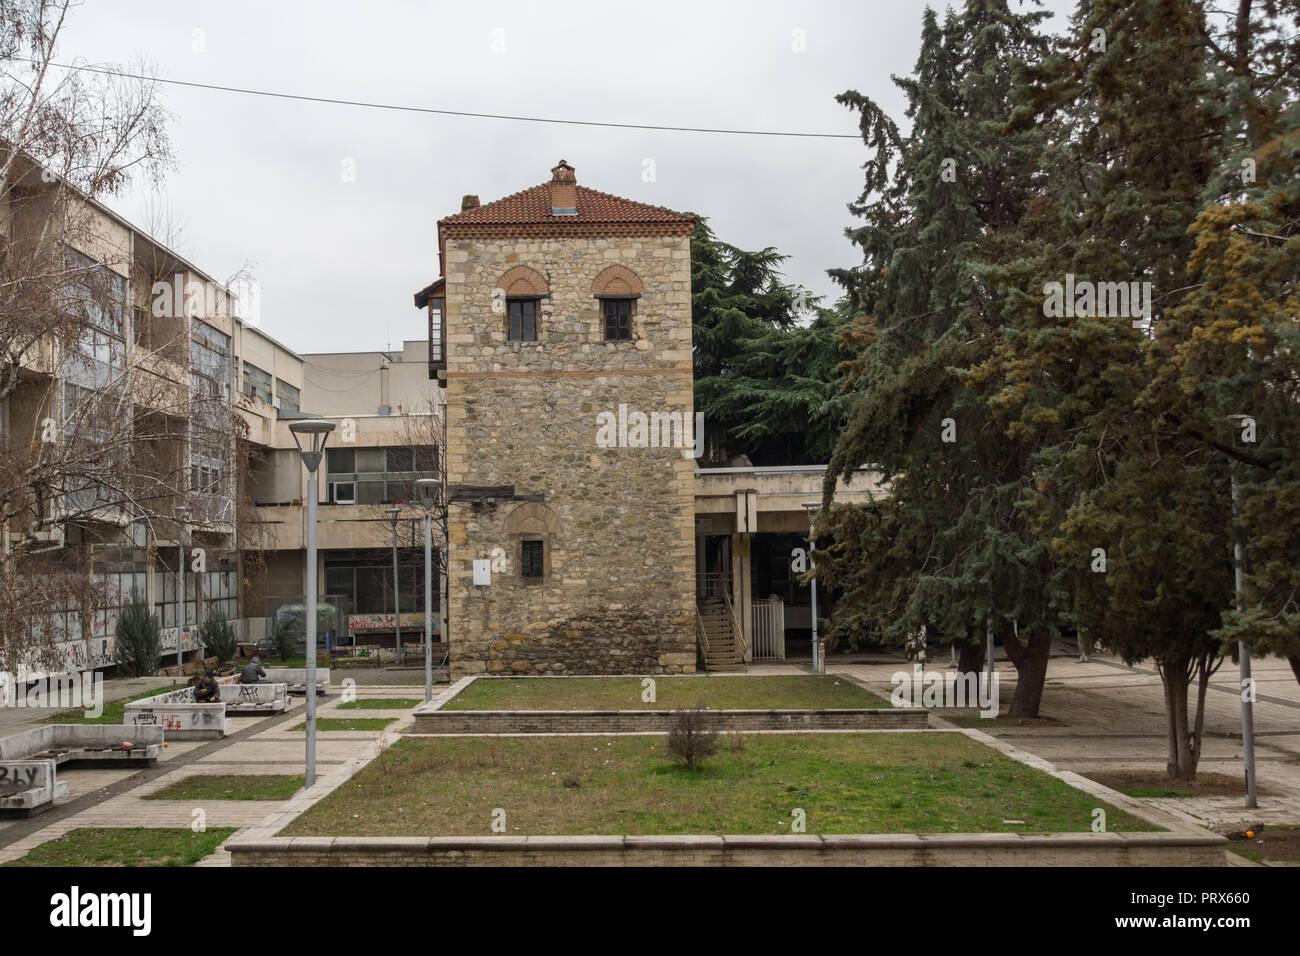 SKOPJE, REPUBLIC OF MACEDONIA - FEBRUARY 24, 2018:  Ruins of Feudal Tower in city of Skopje, Republic of Macedonia - Stock Image